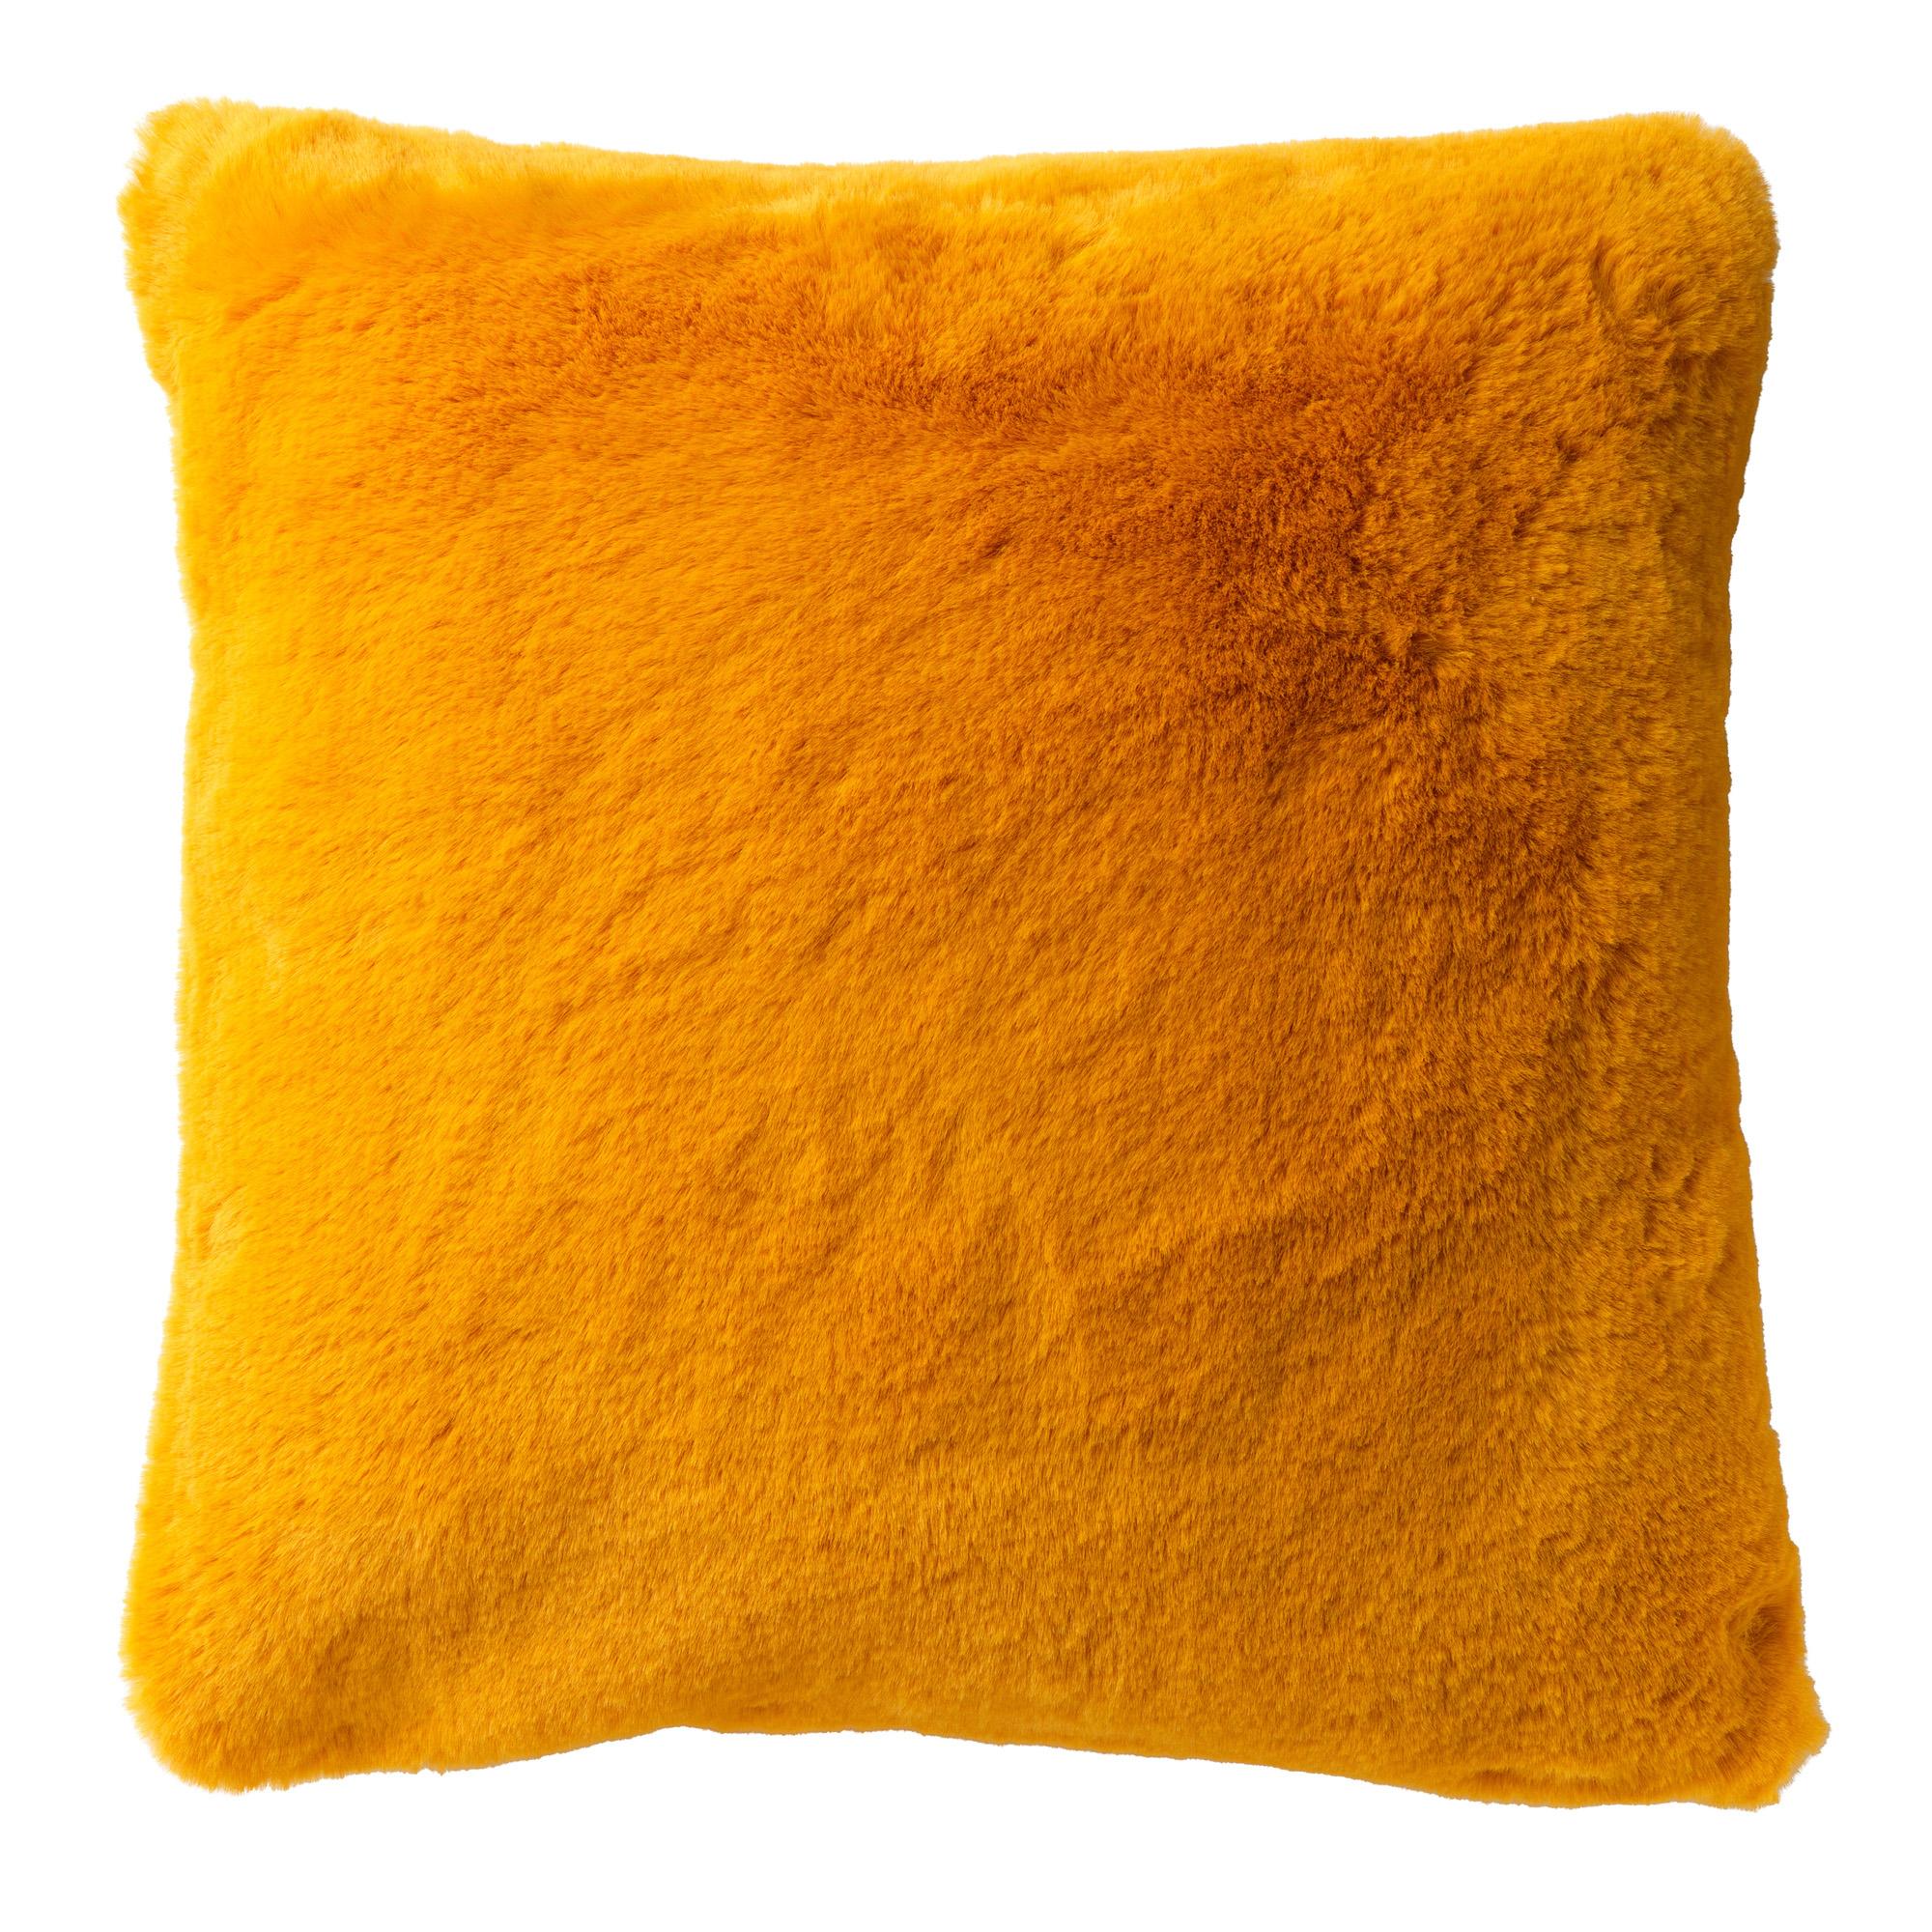 ZAYA - Sierkussen unikleur Golden Glow 45x45 cm